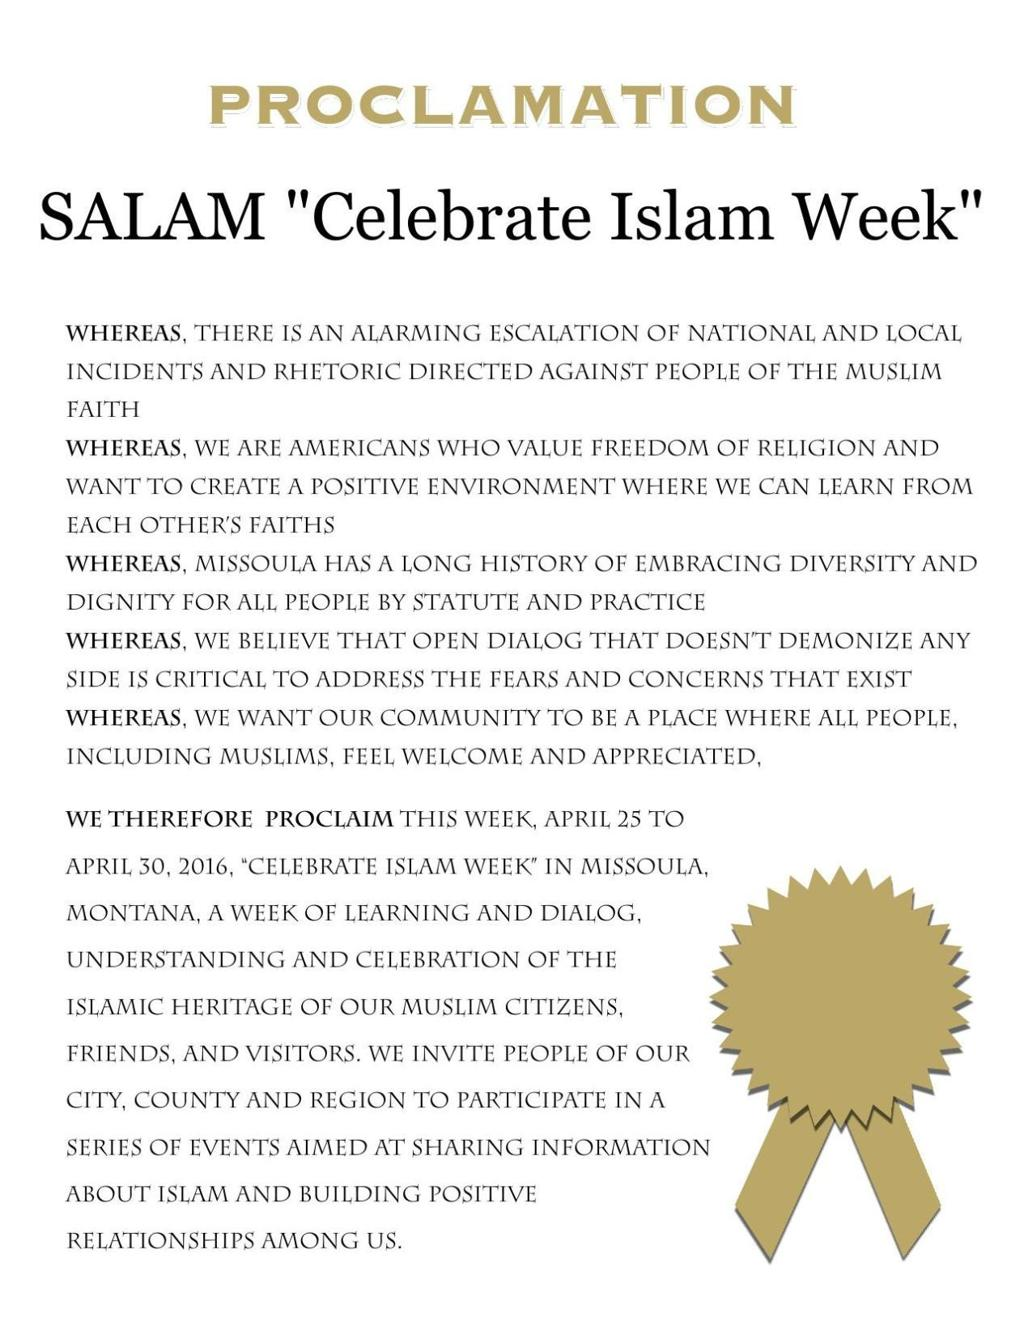 Isis Hijabs And Prayer Missoula Holding Week Of Islam Celebration